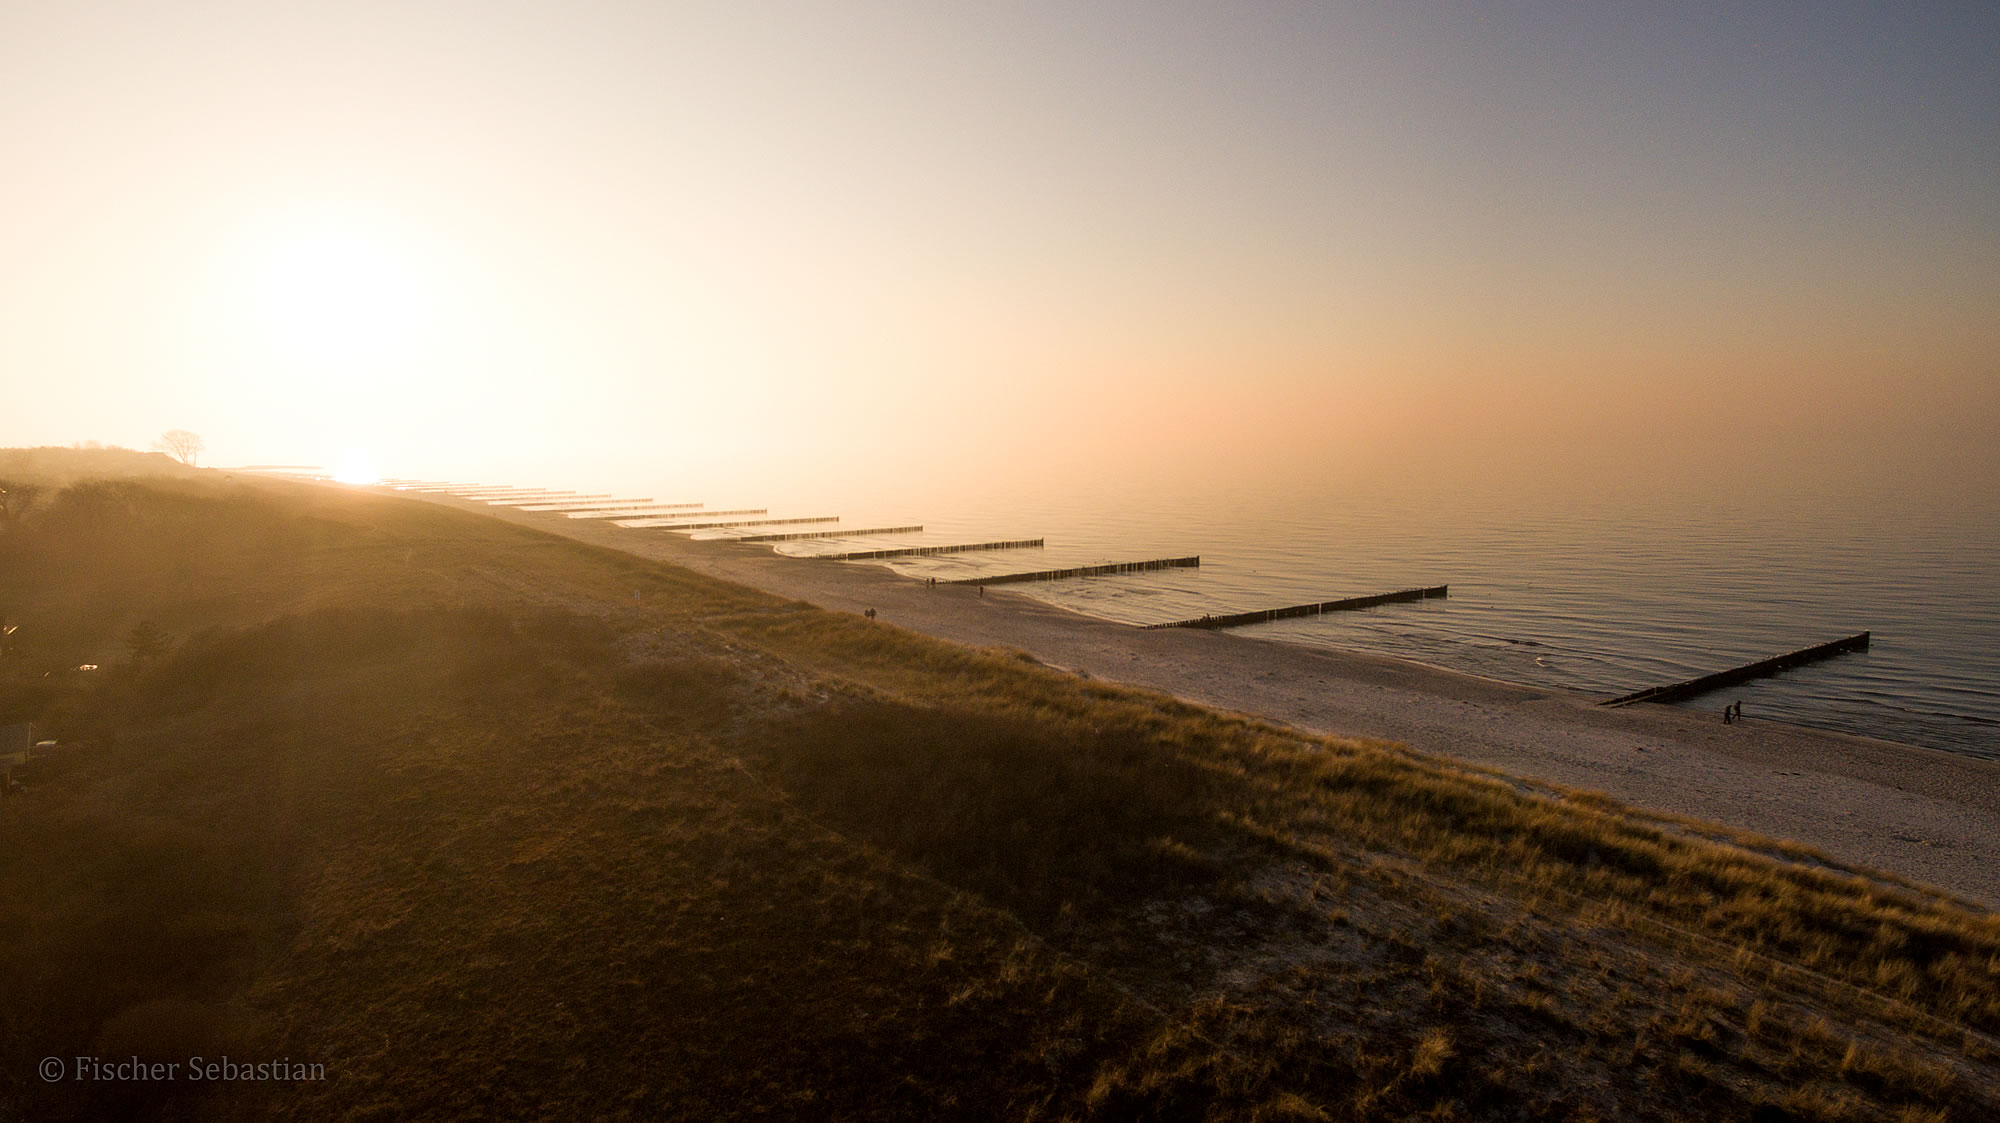 Blick zum Strand vor Hotel Namenlos, Drohnenfoto